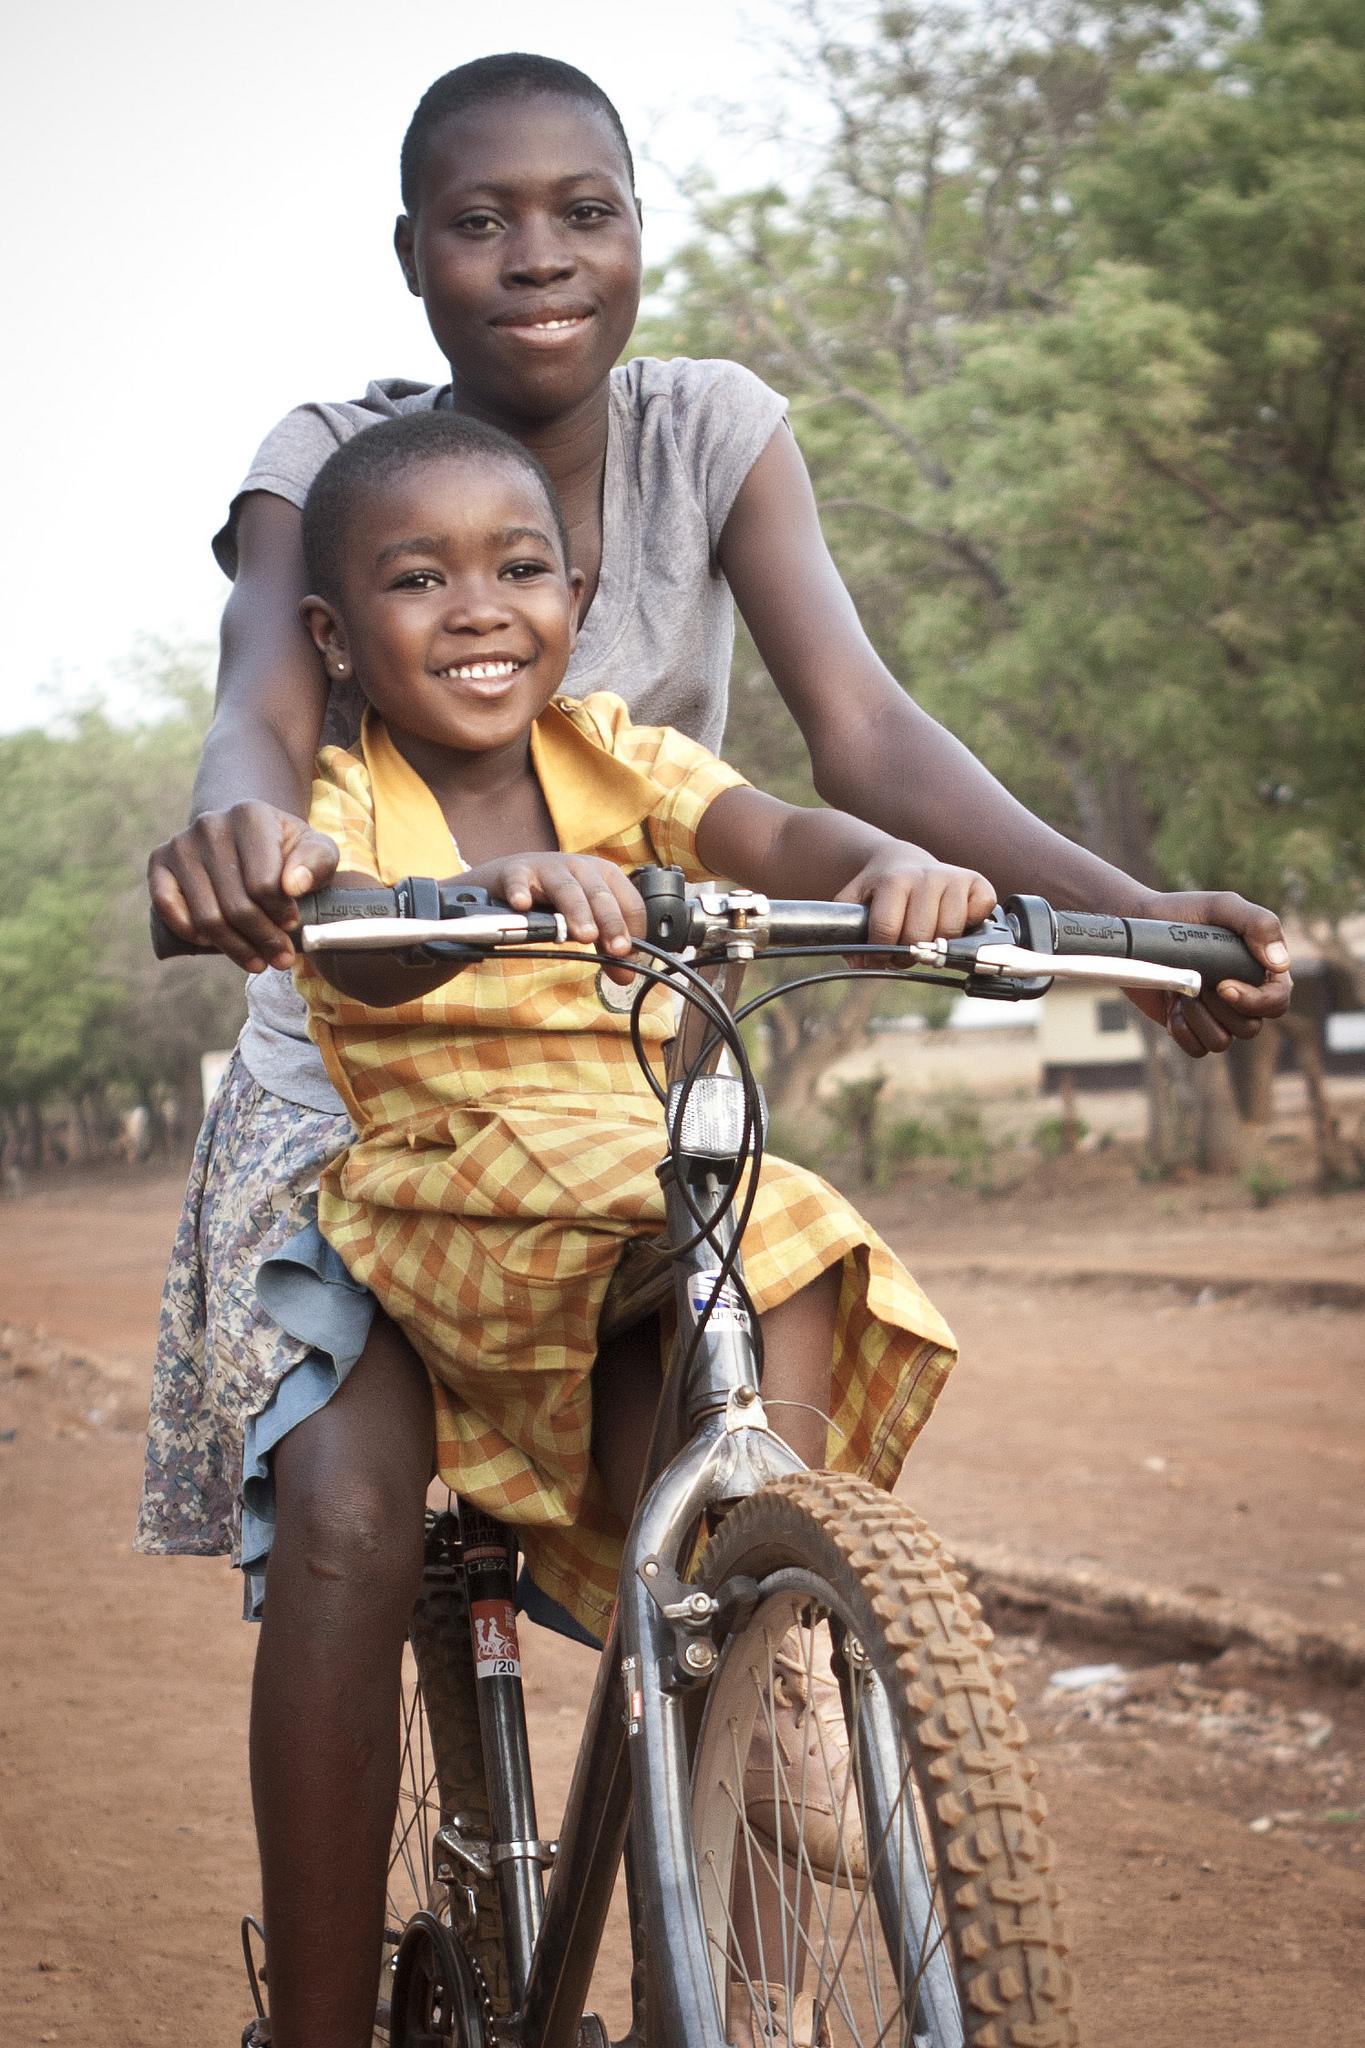 Recycle charity girl on bike